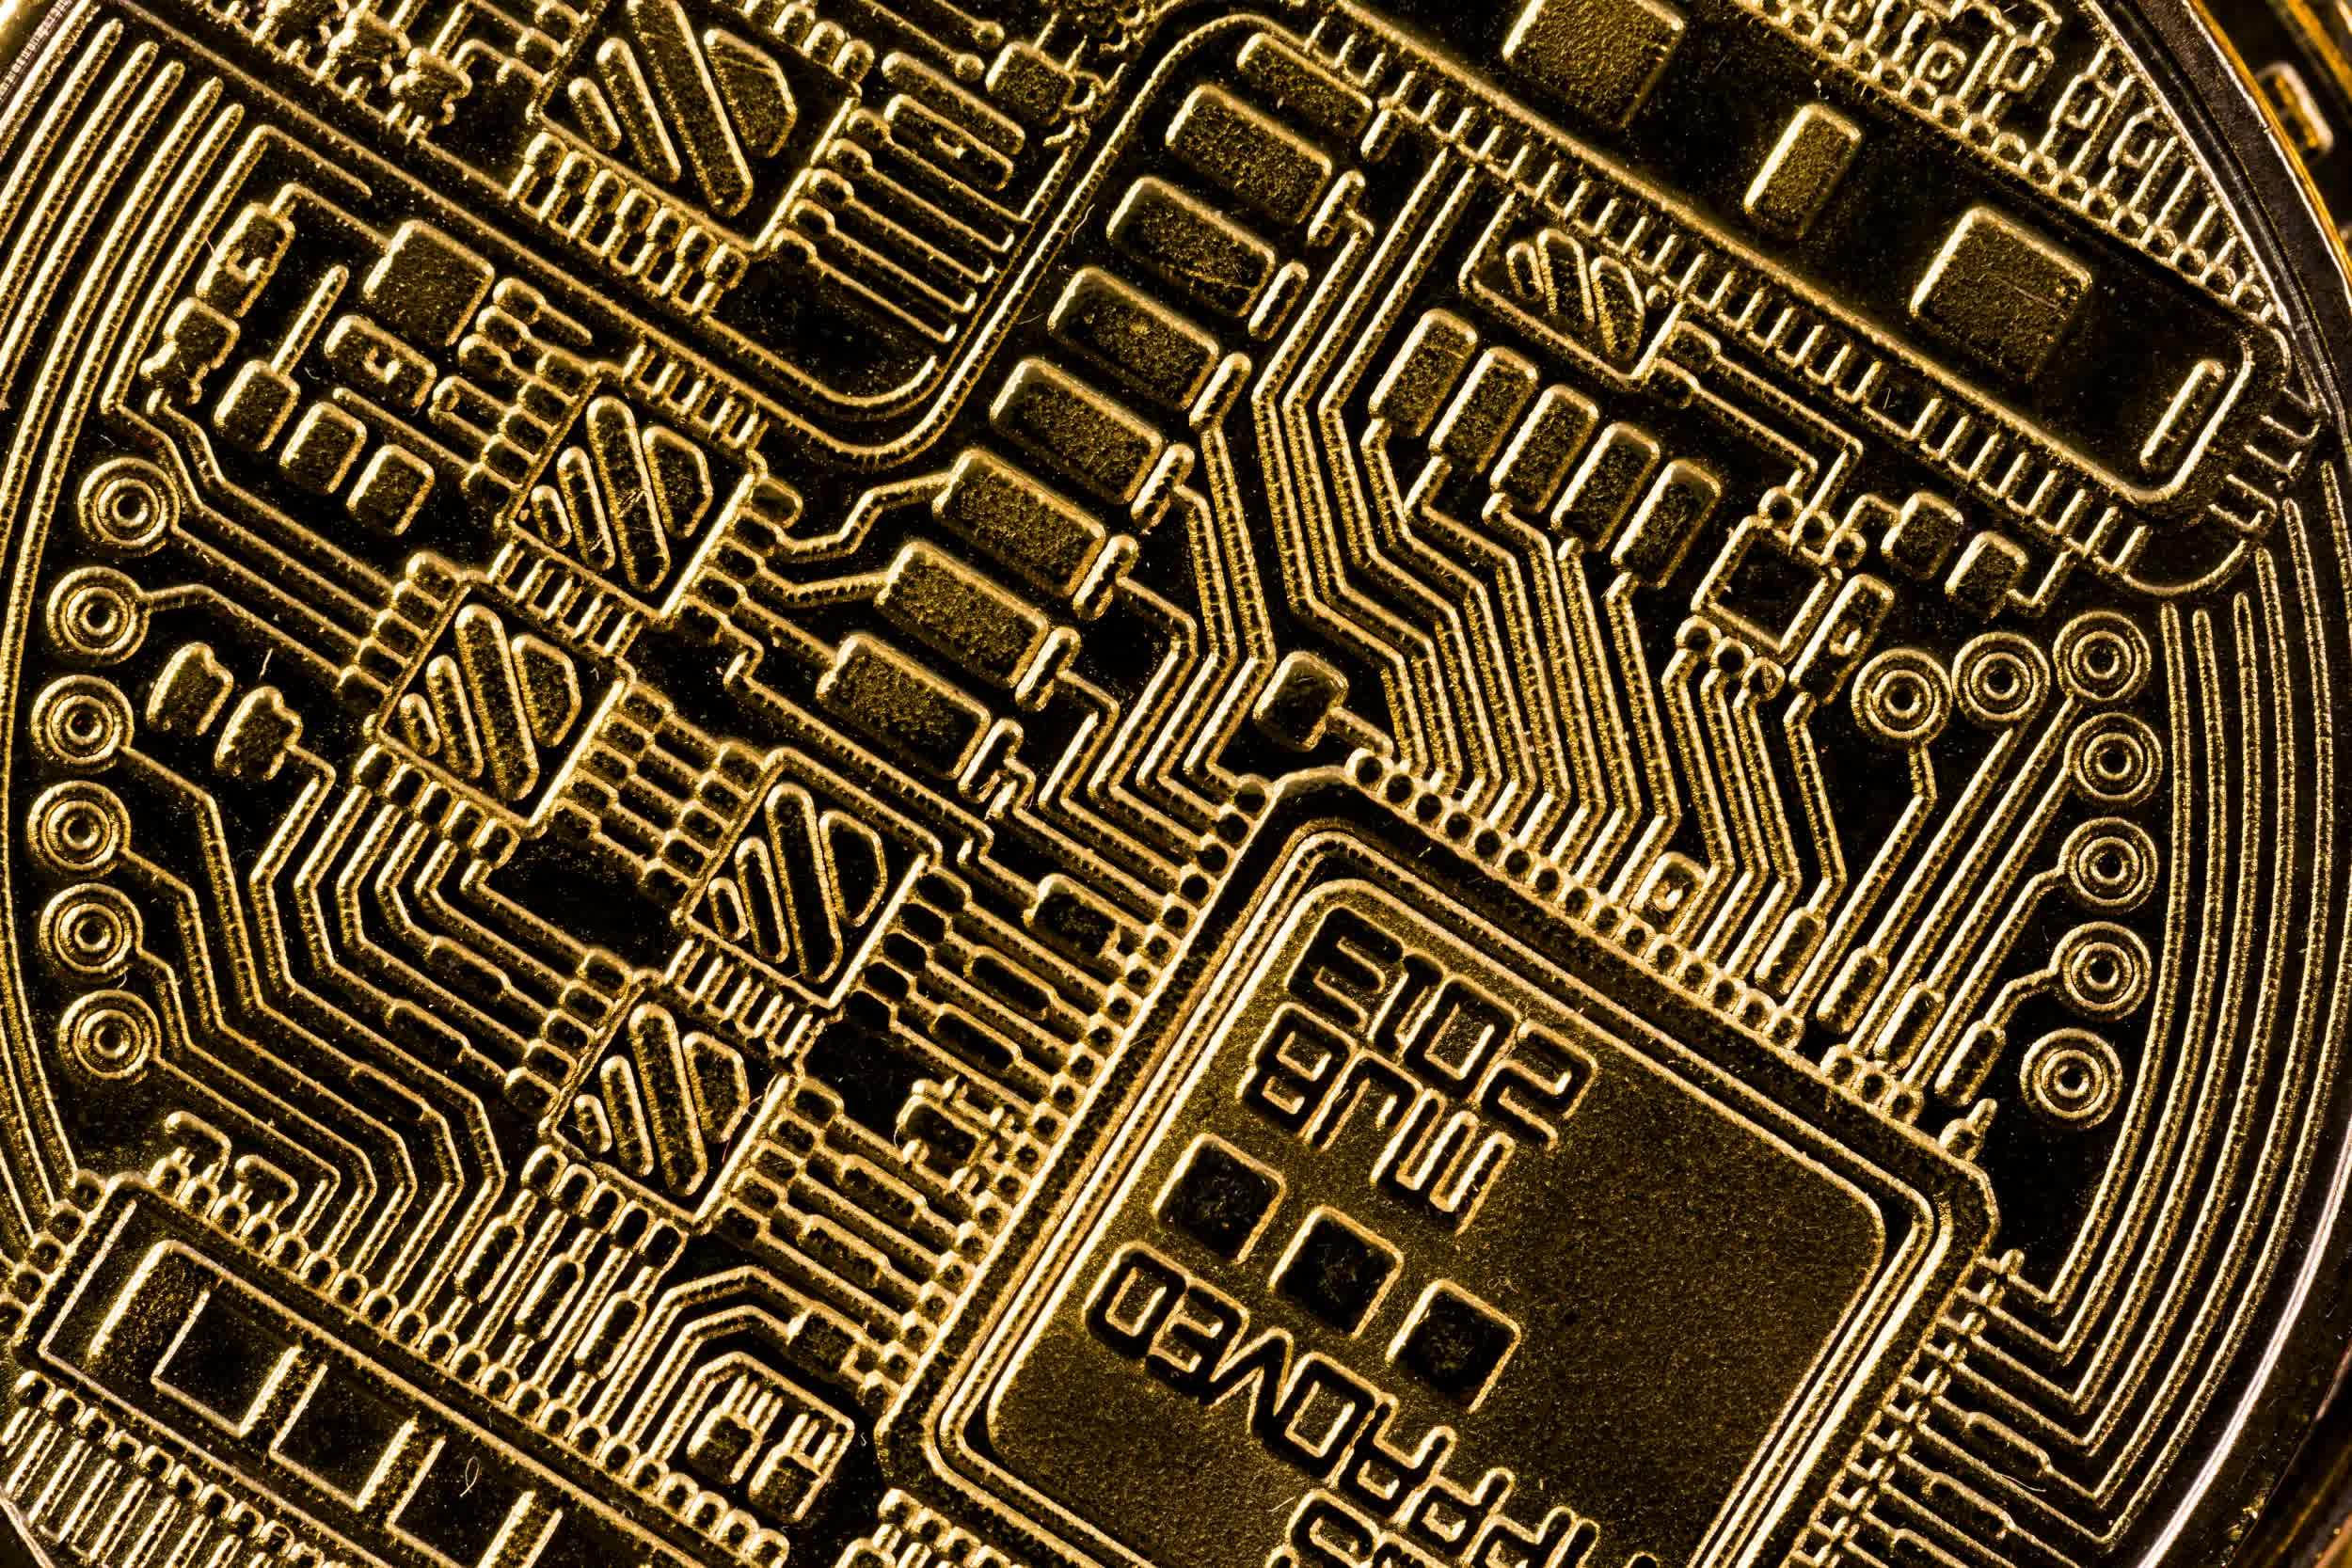 Square creates crypto consortium to keep patent trolls at bay